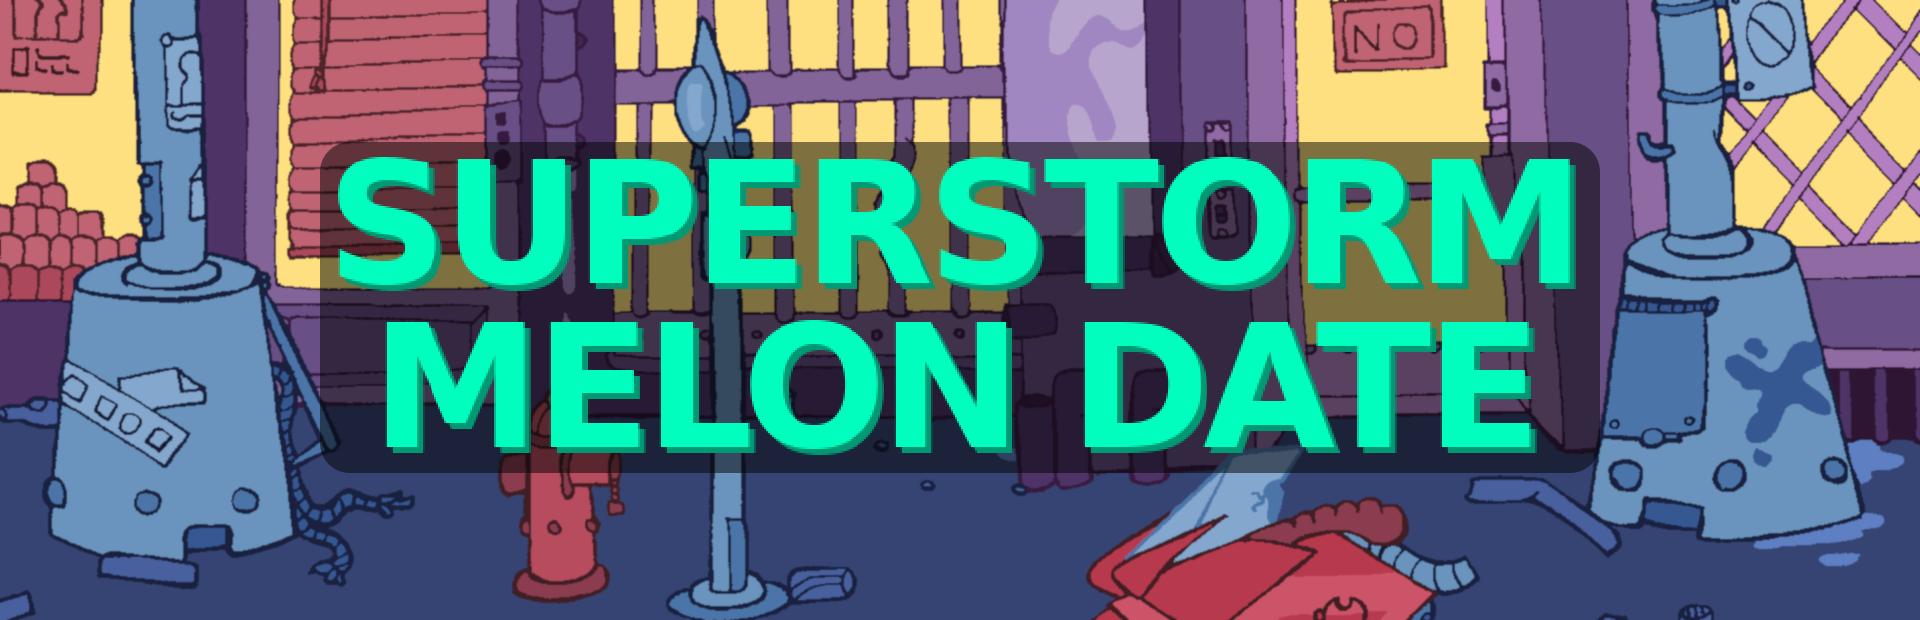 Superstorm Melon Date